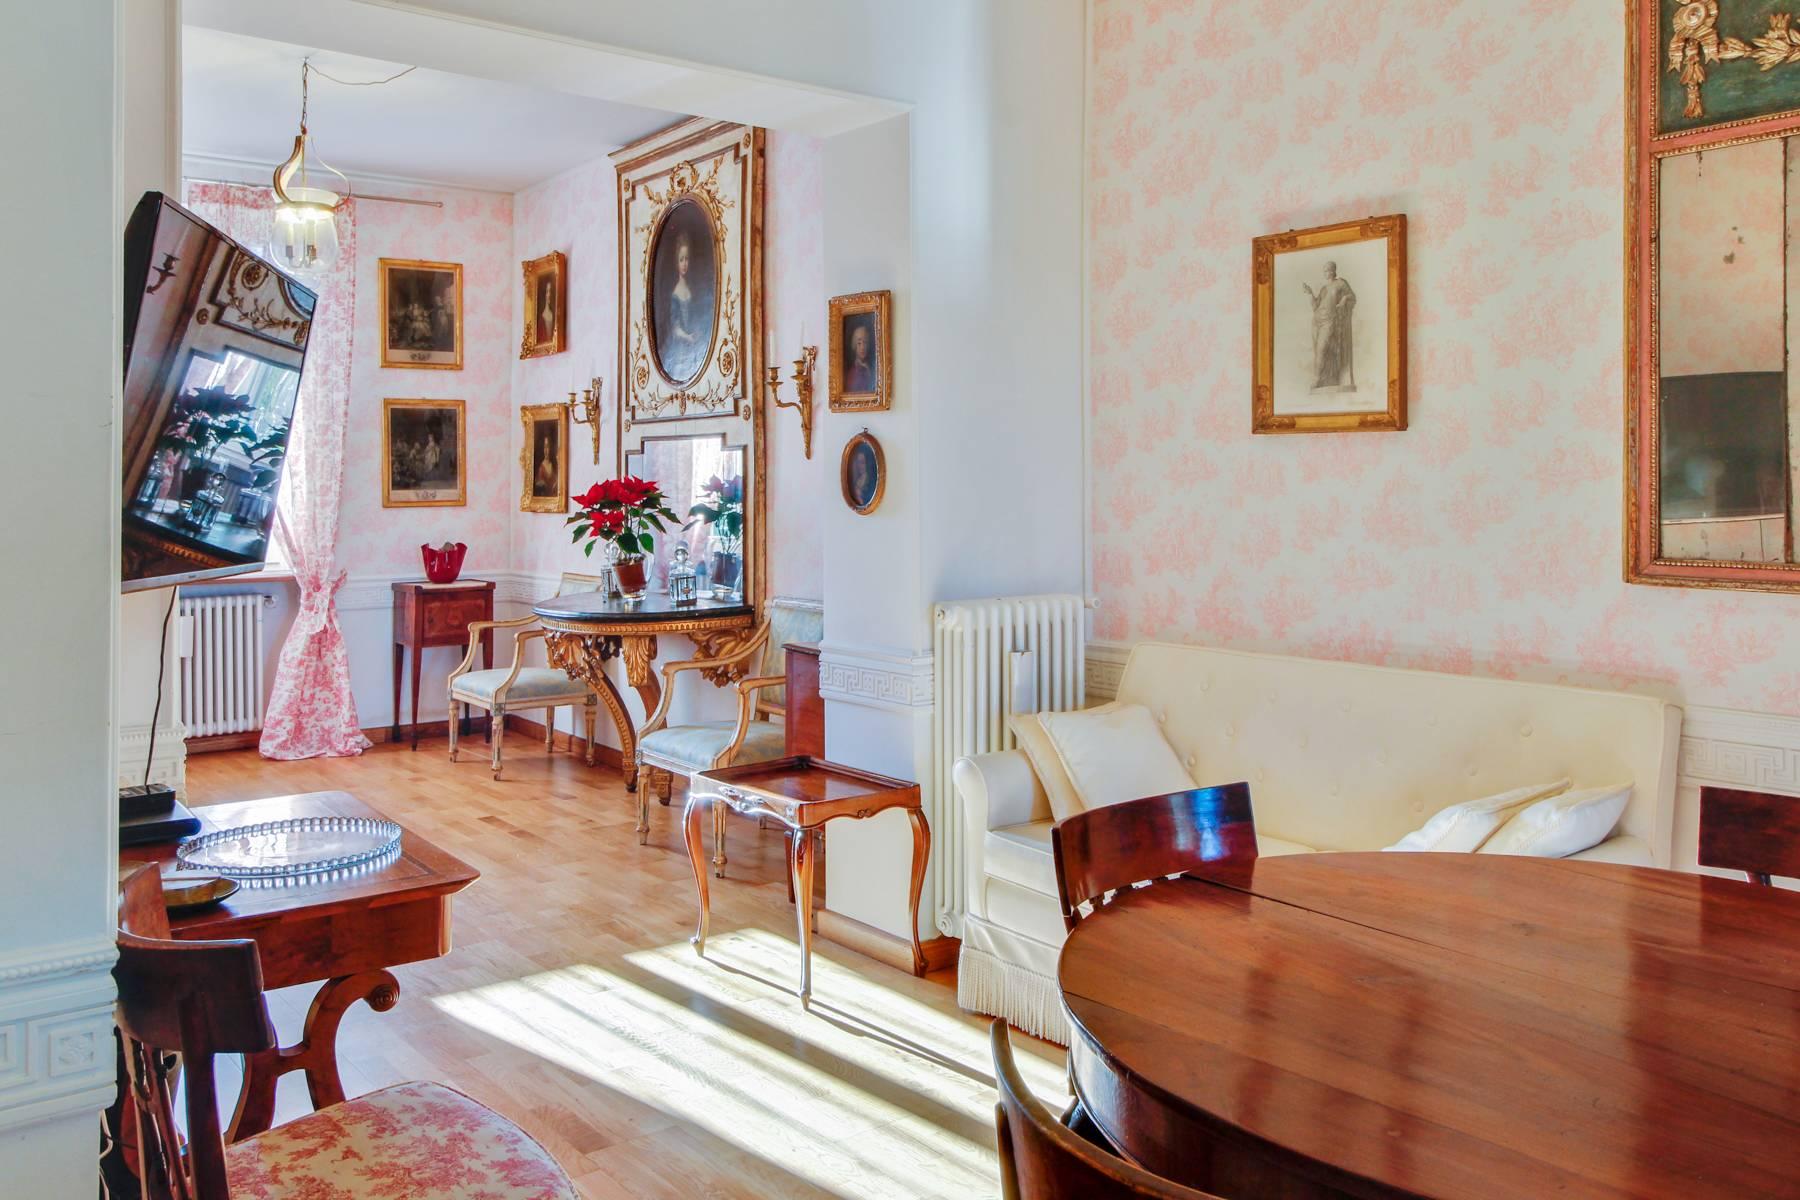 Casa indipendente in Vendita a Torino: 5 locali, 270 mq - Foto 7